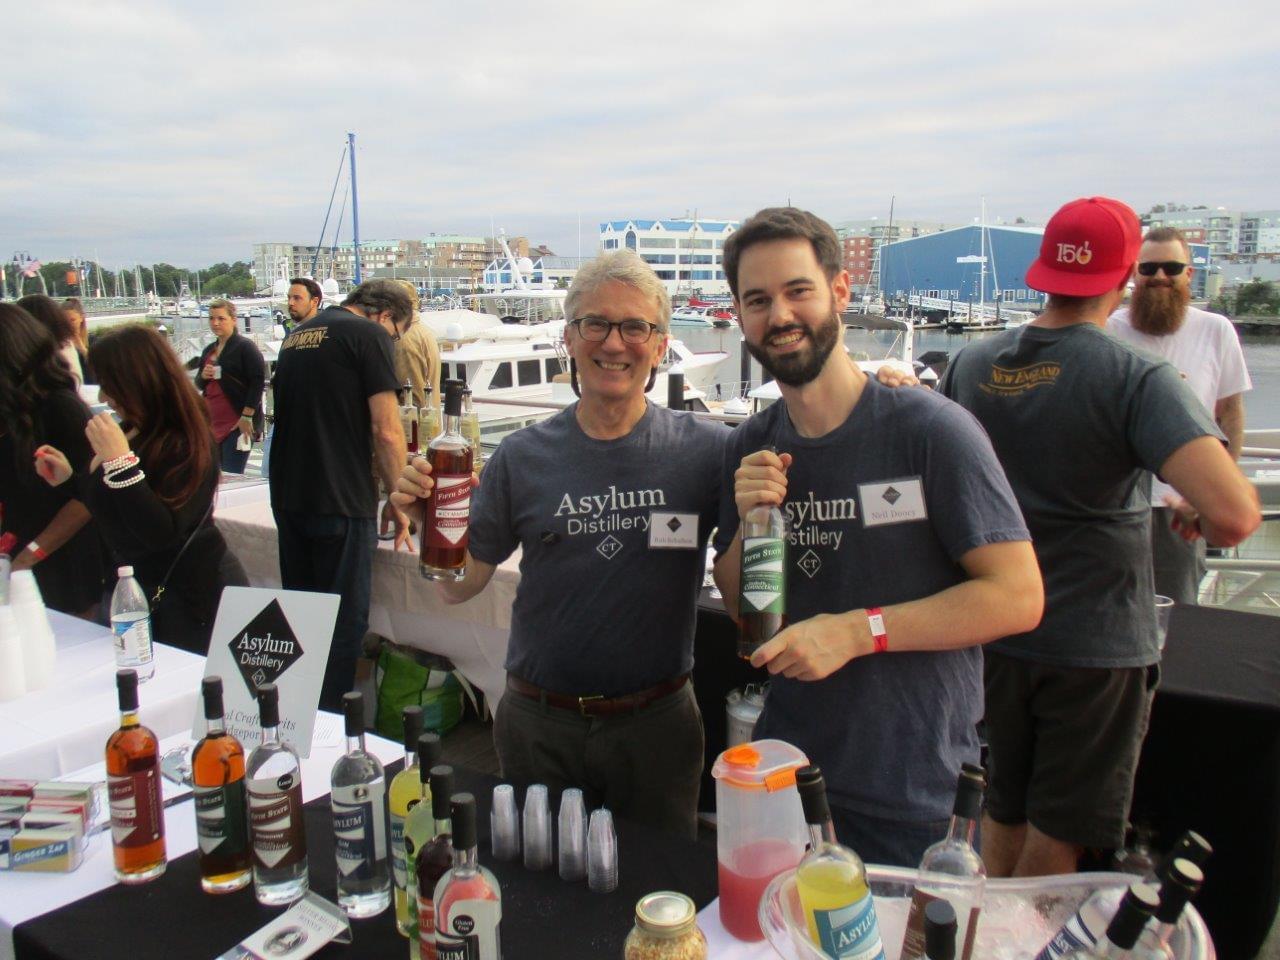 Stamford Brew and Whiskey Fest